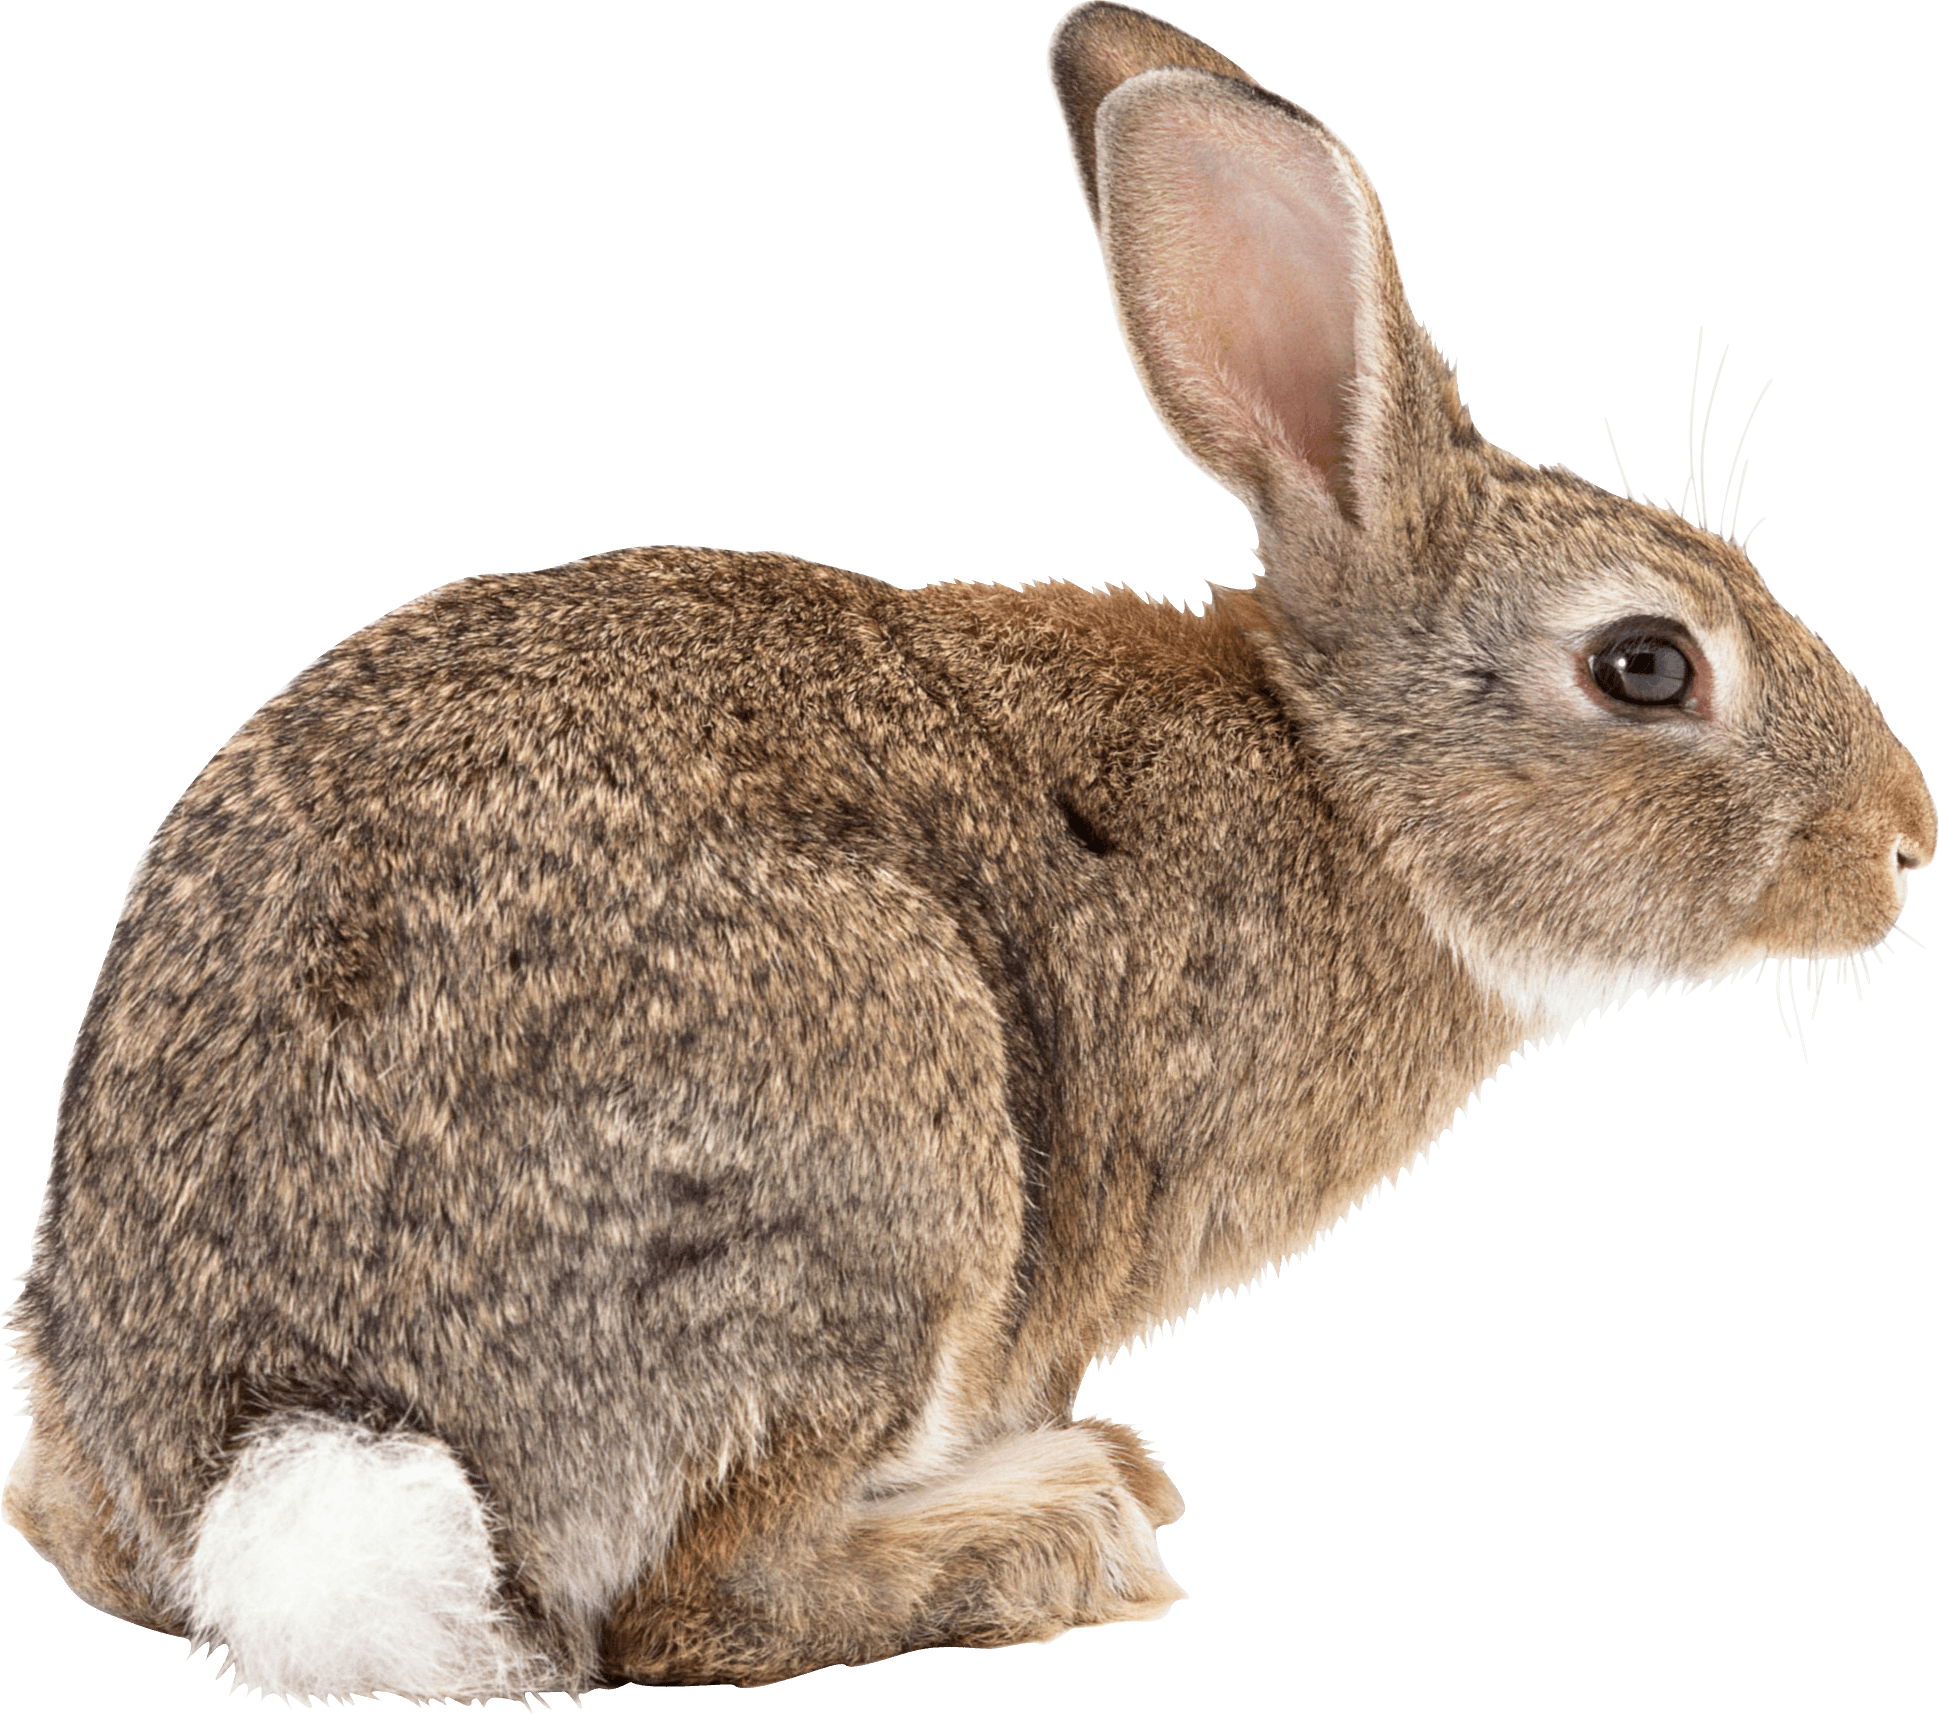 Rabbit Png Image #40318 - Rabbit, Transparent background PNG HD thumbnail